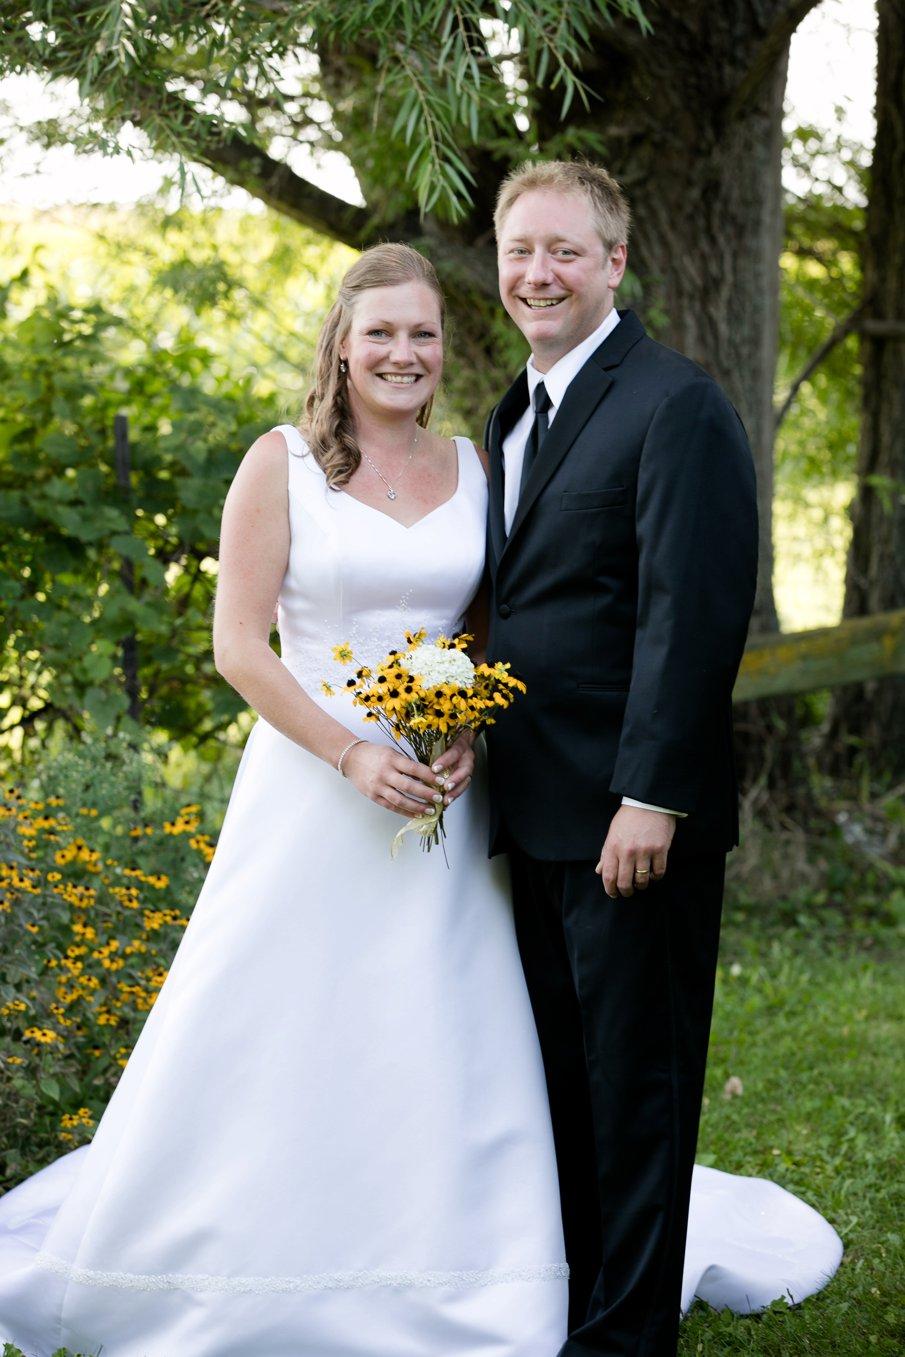 Alice Hq Photography | Tina + Chris | Southern MN Backyard wedding7.jpg